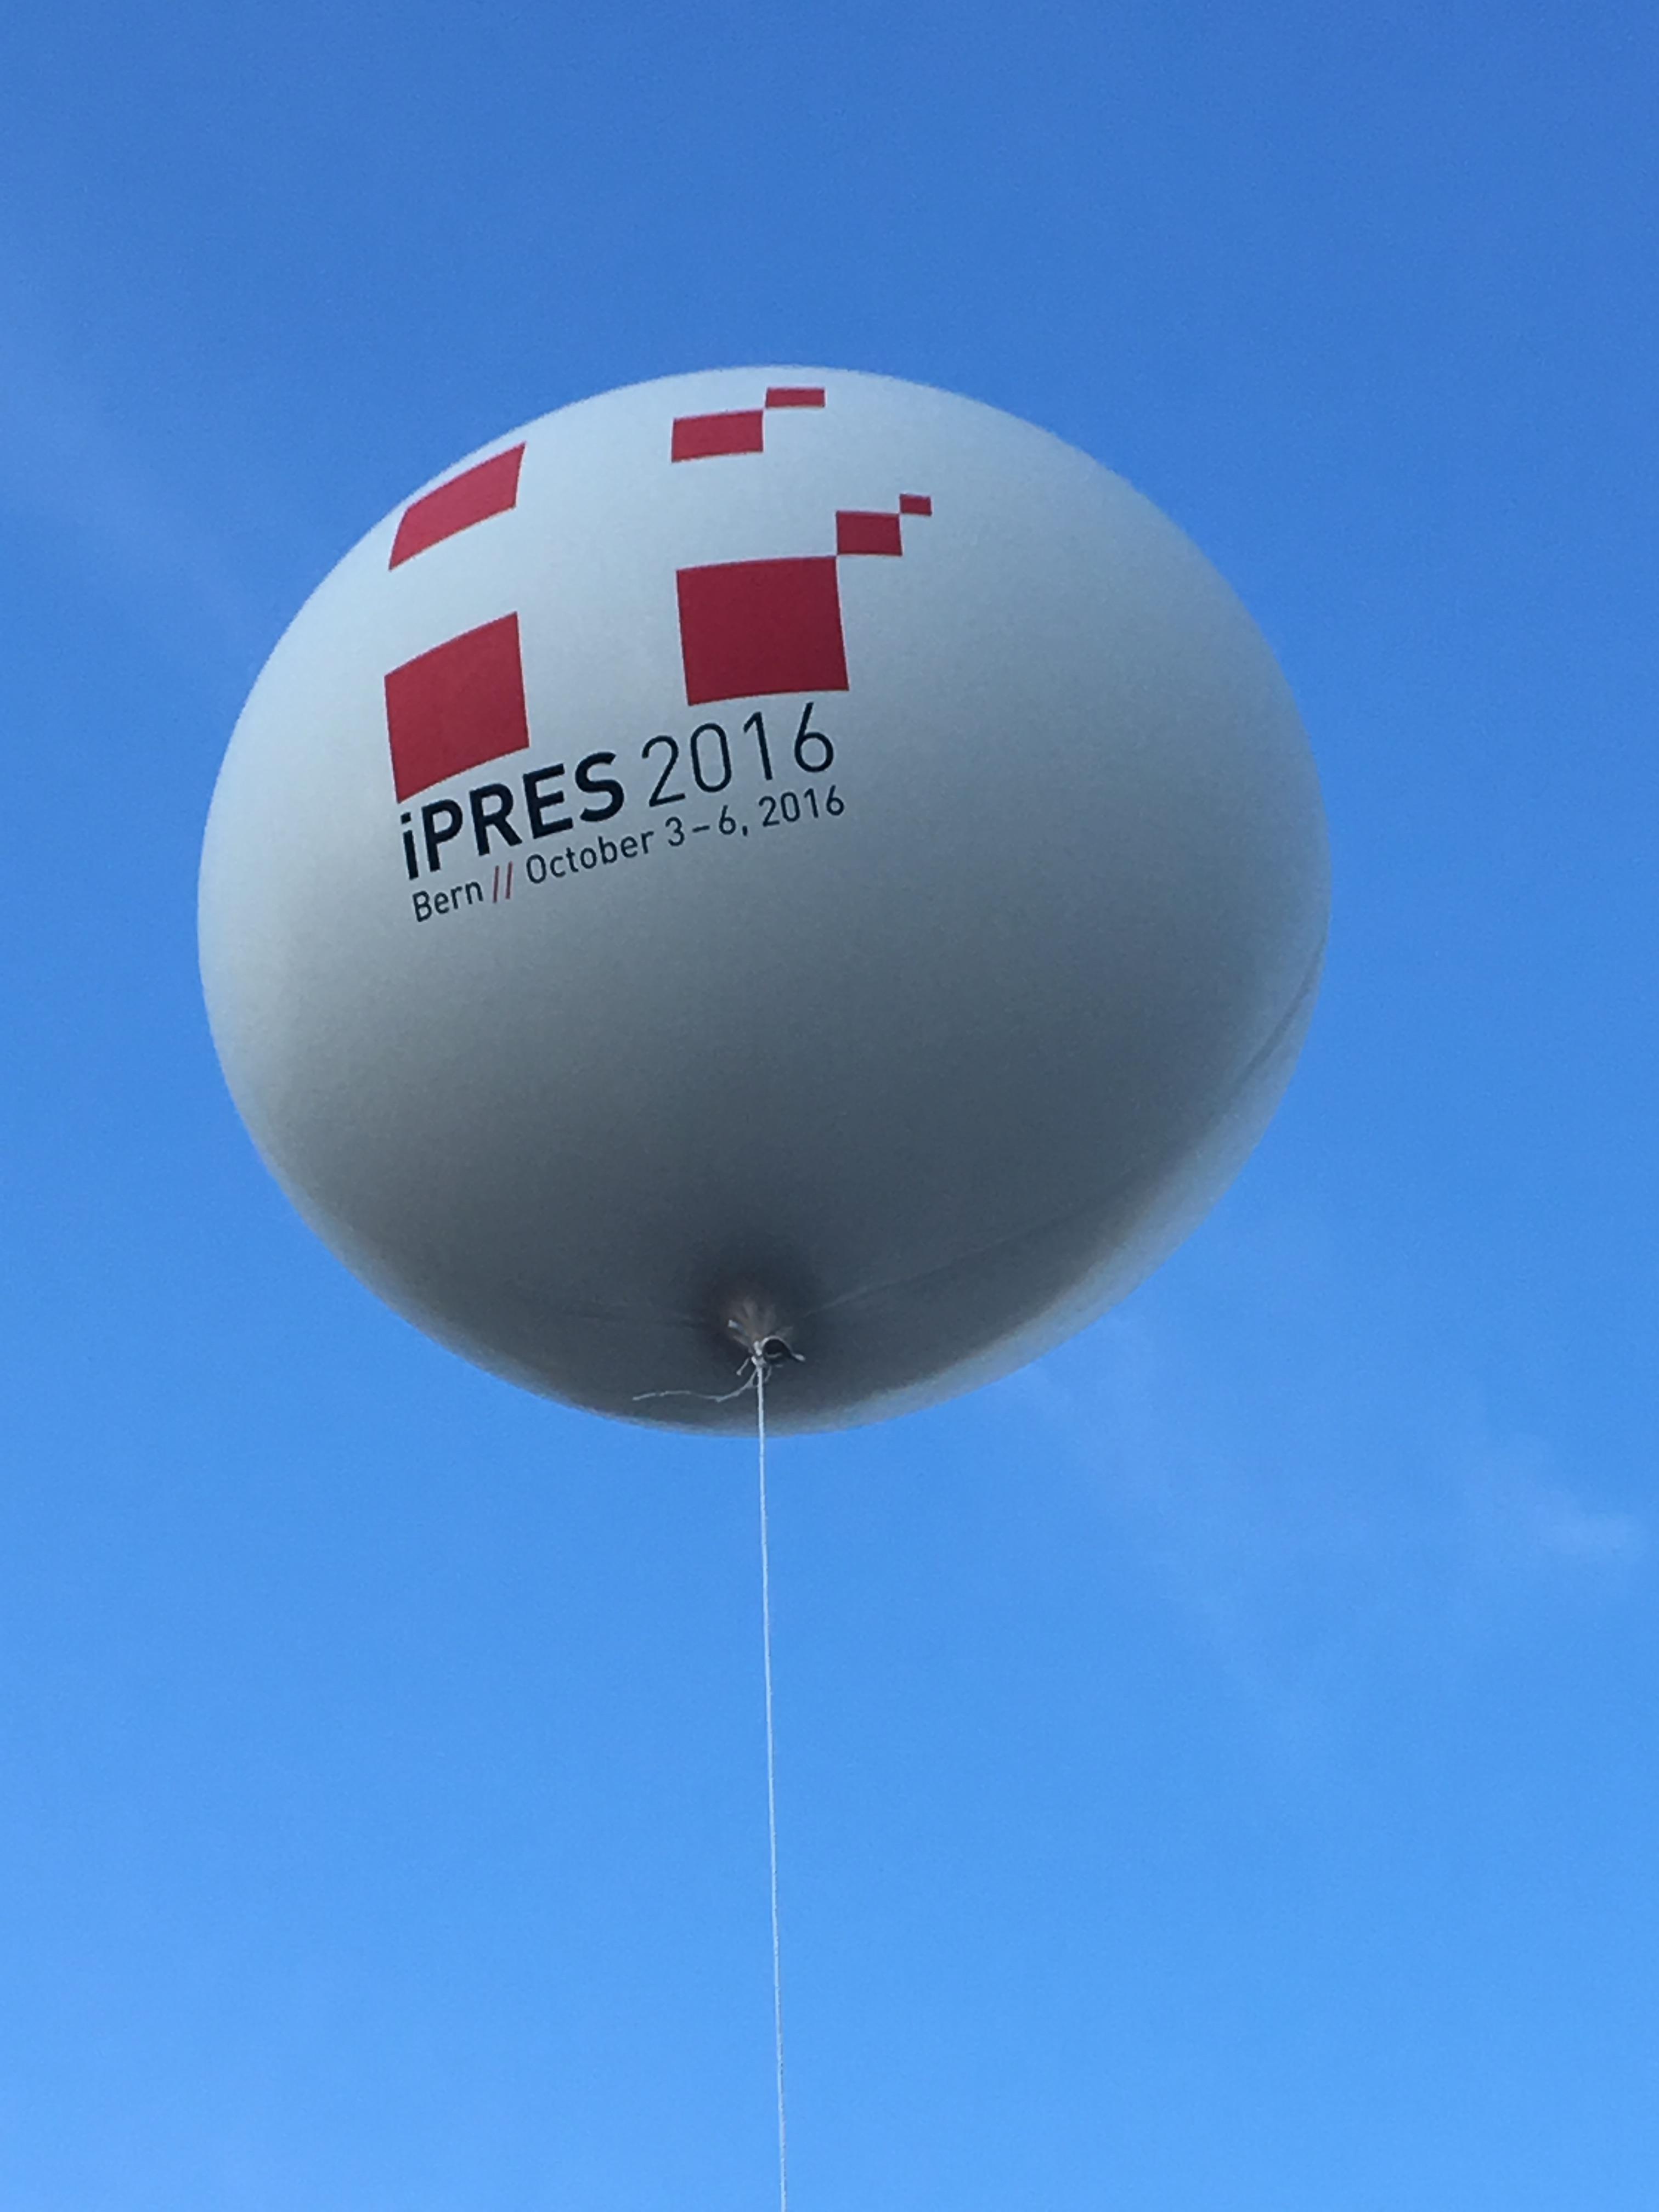 iPRES 2016 balloon